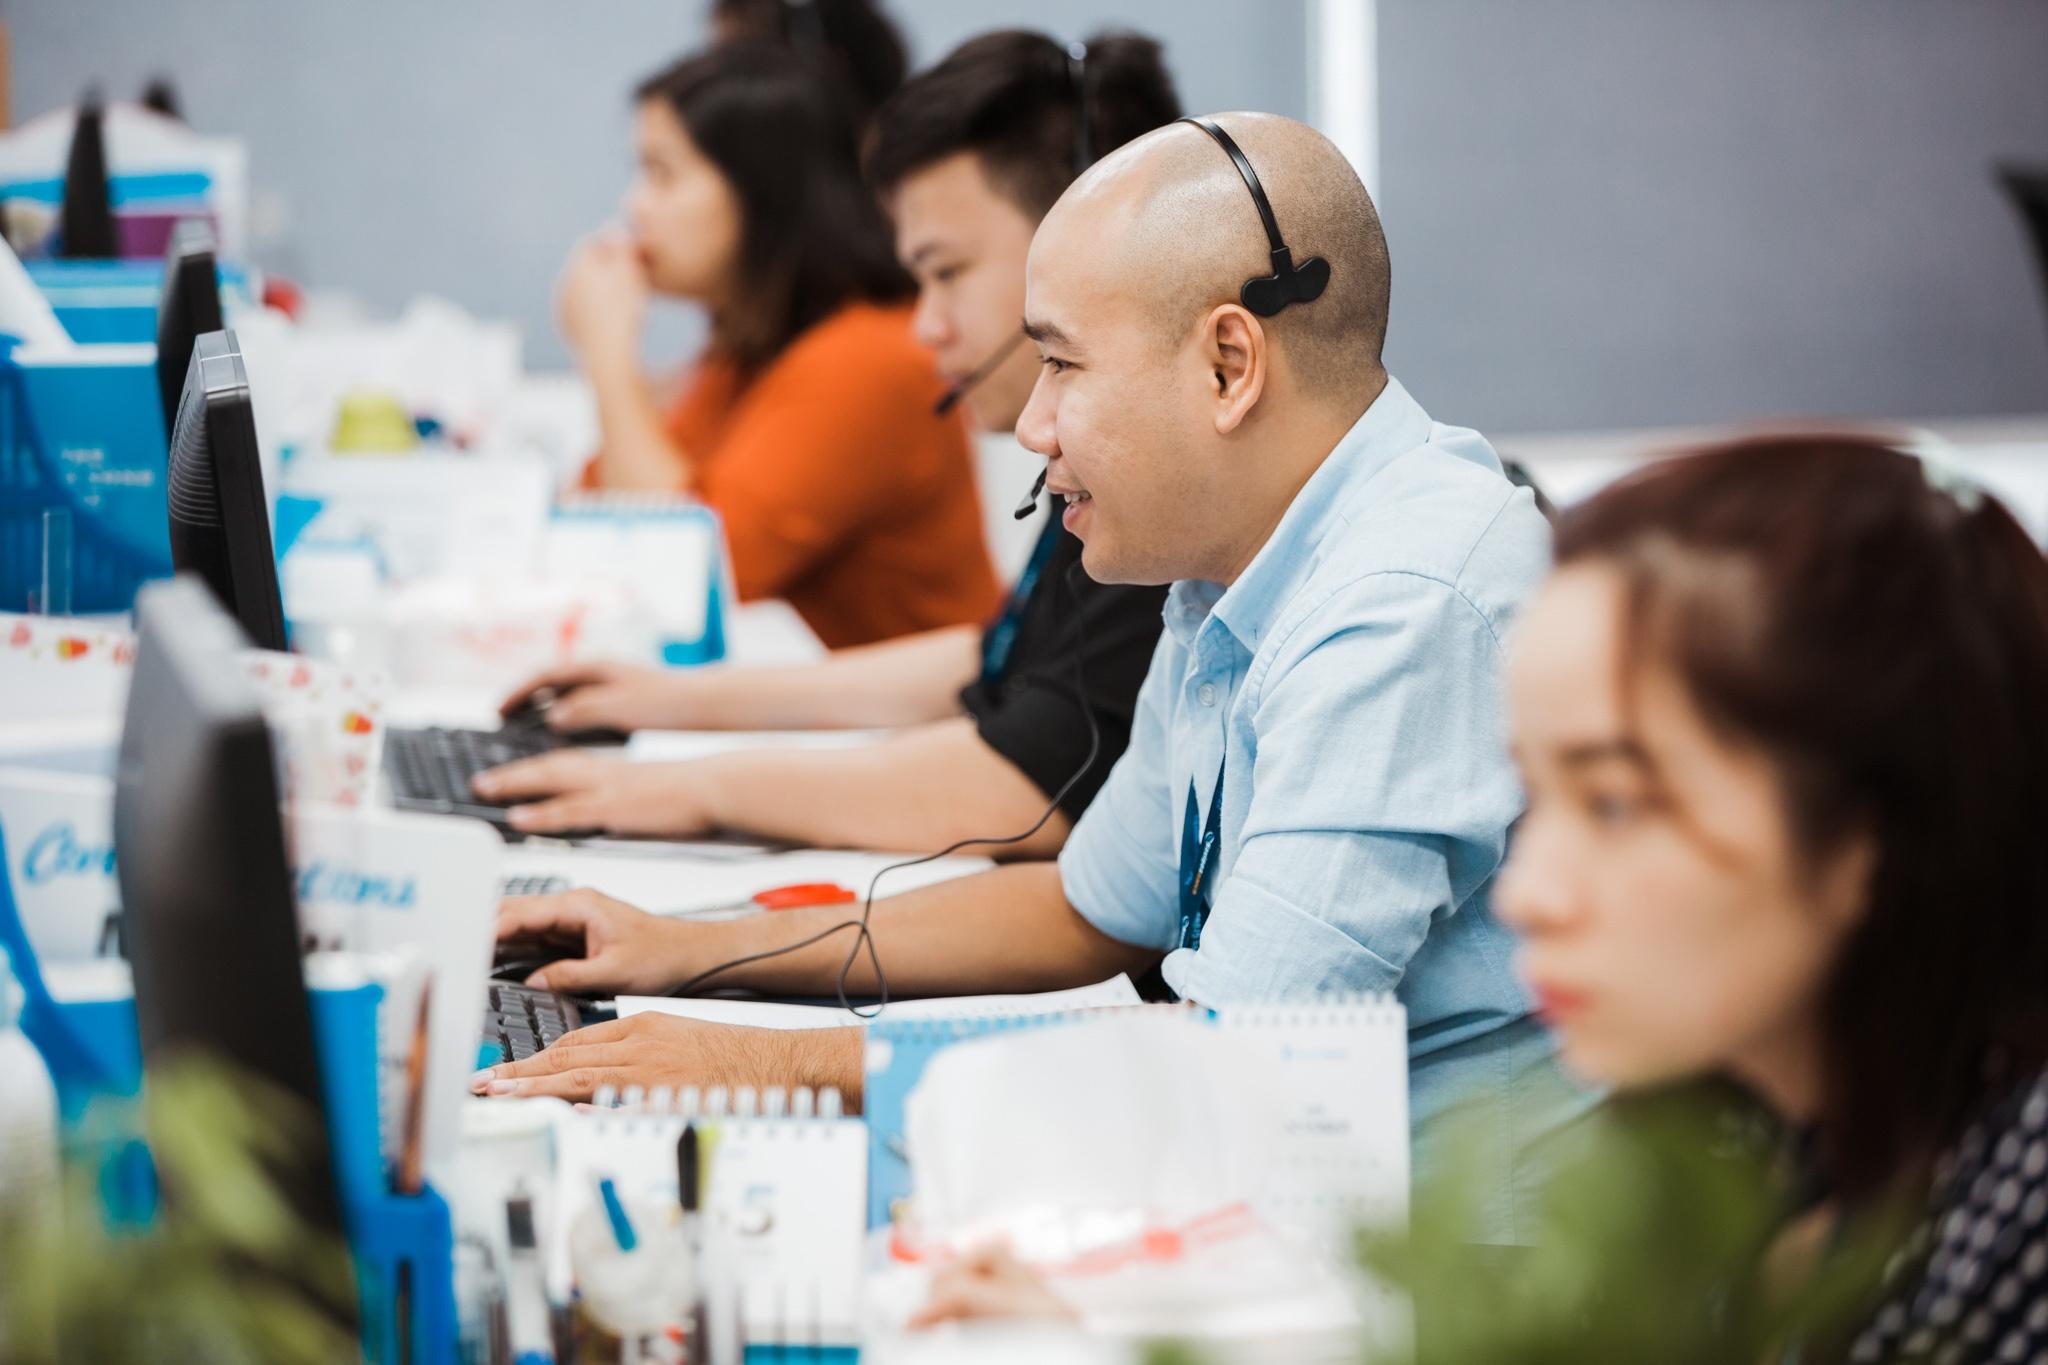 Giam doc KD VietnamWorks: 'Sales khong phai nghe di xin, ma la di cho' hinh anh 9